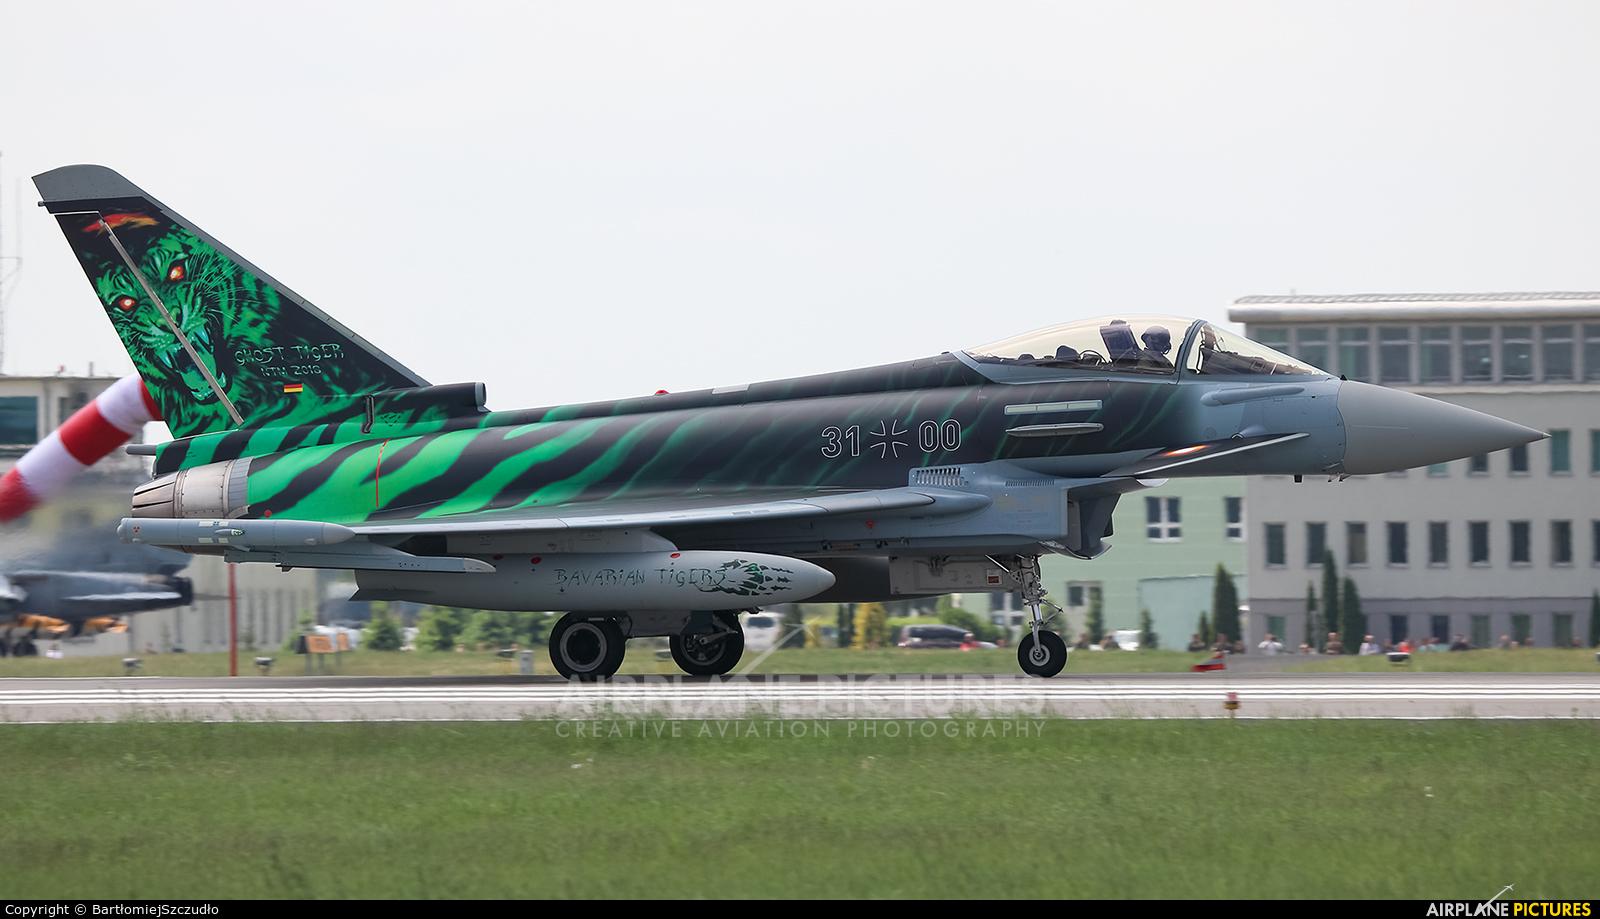 Germany - Air Force 3100 aircraft at Poznań - Krzesiny